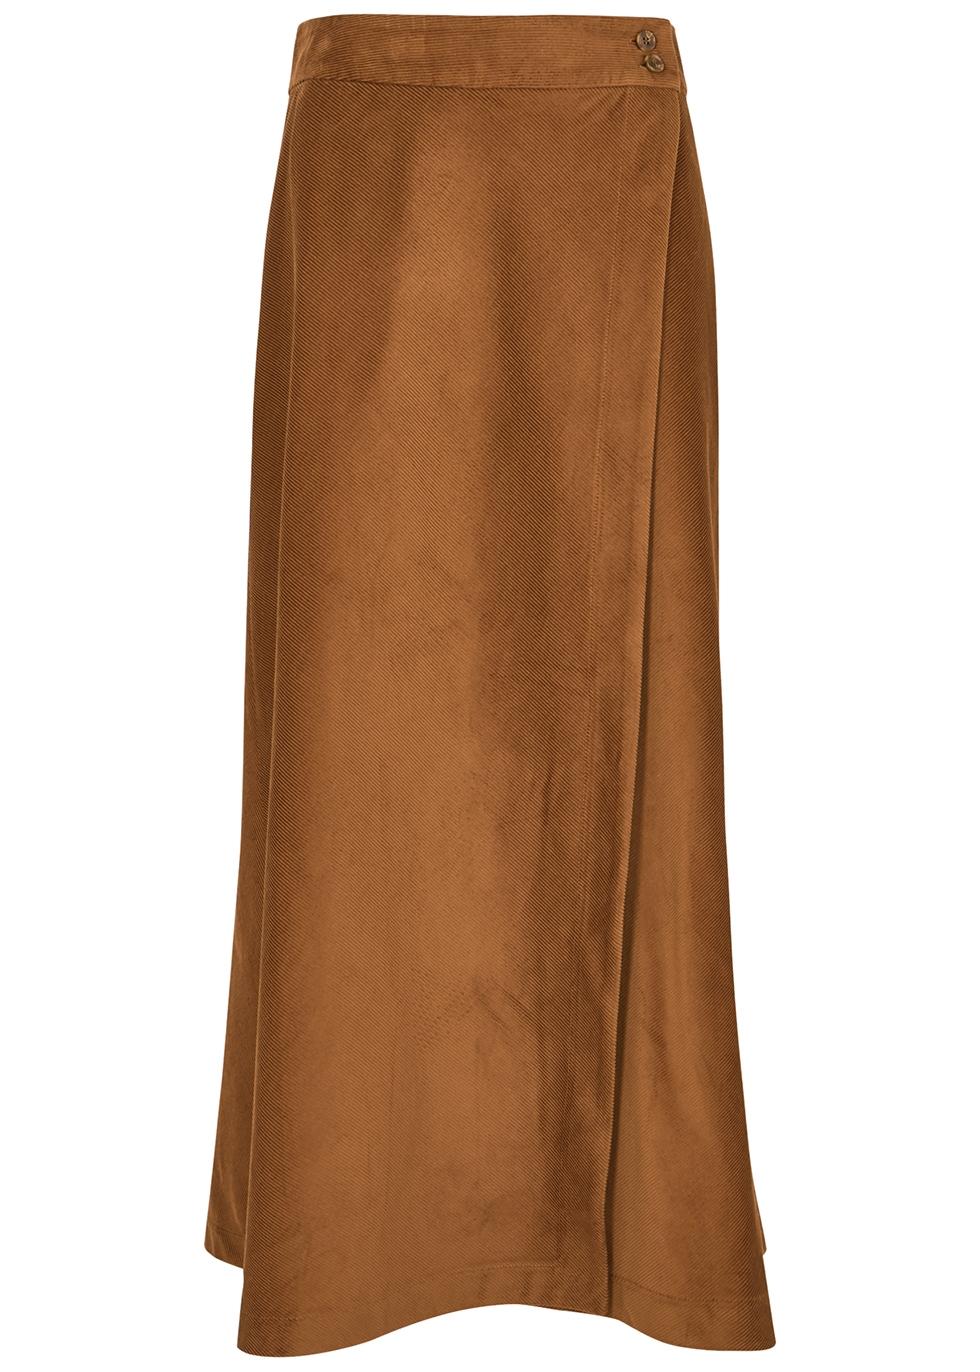 Theo brown corduroy midi skirt